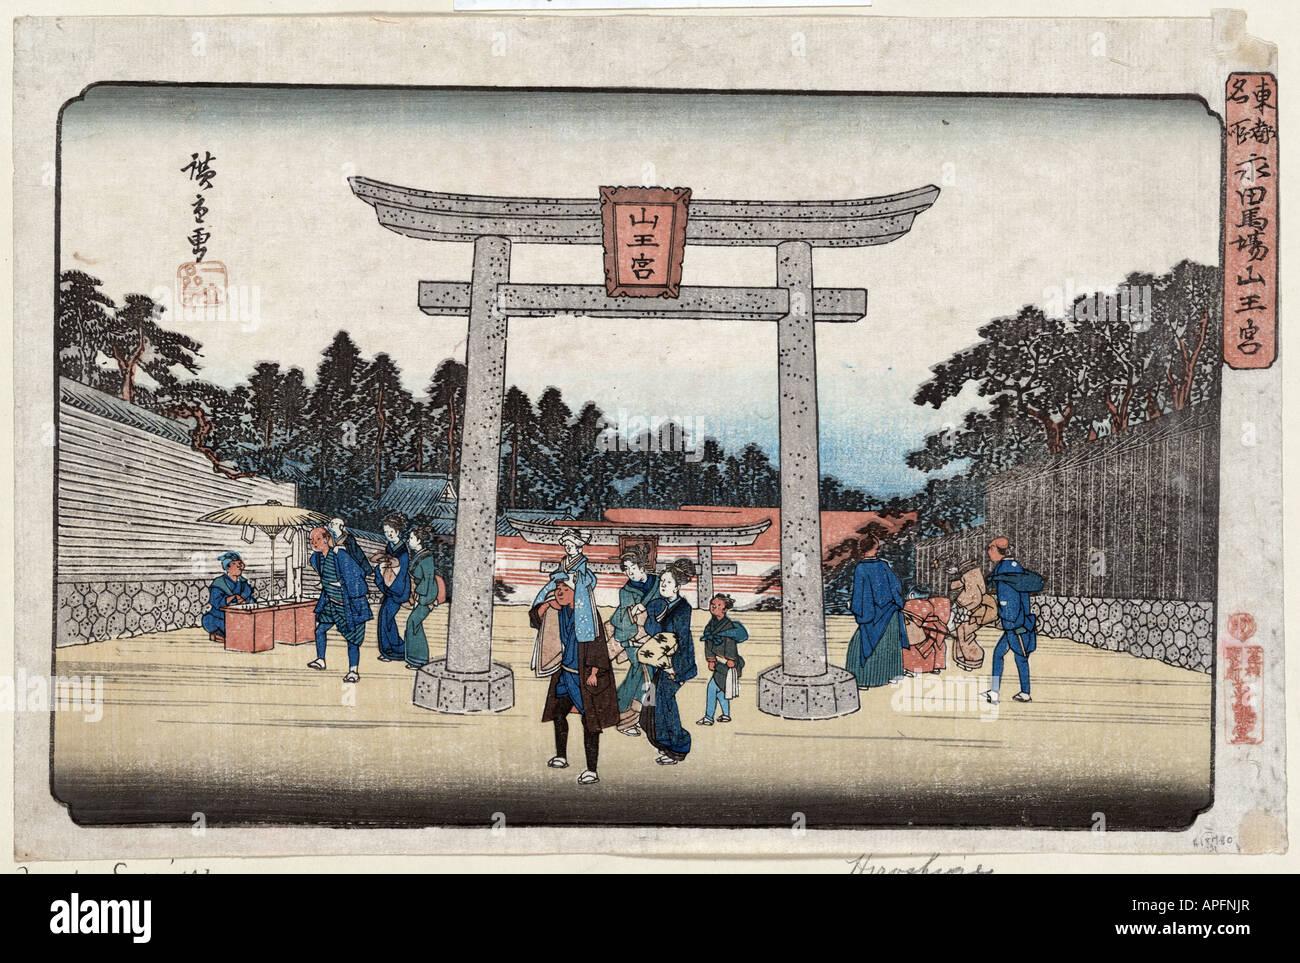 Nagata keine Baba Sannogu Stockbild